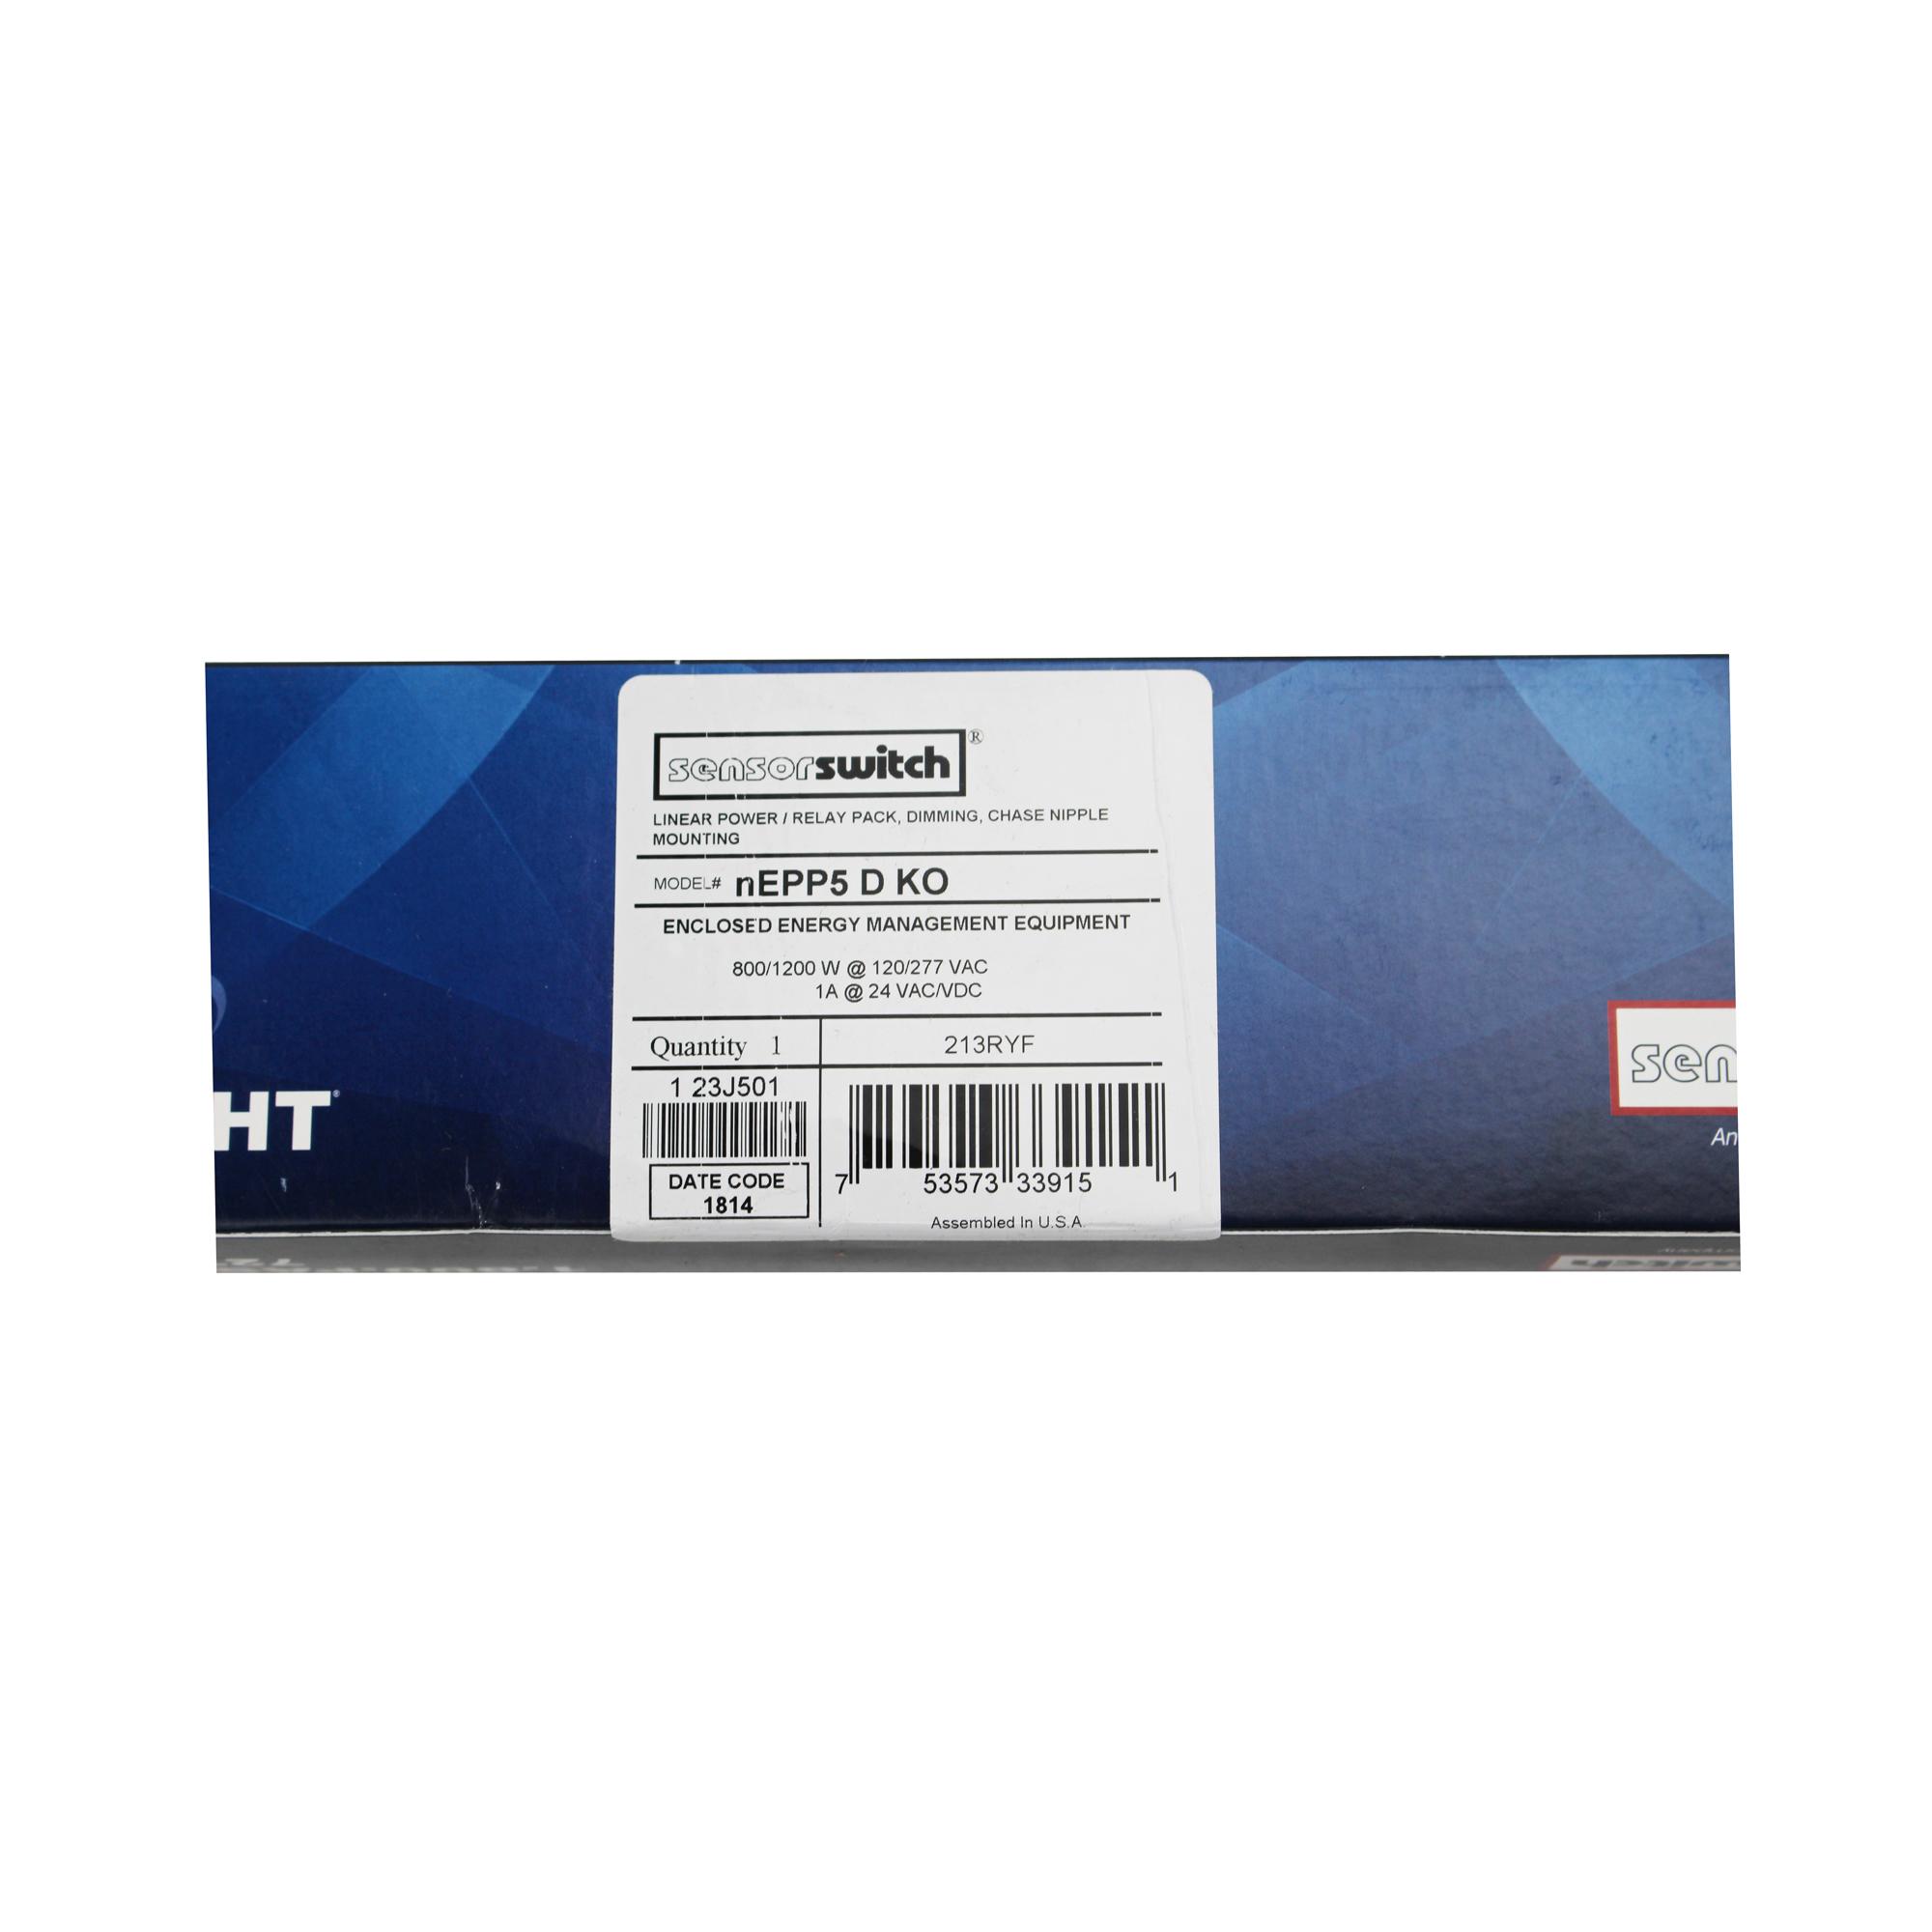 Sensor Switch Nepp5 D Ko Linear Power Relay Pack Dimming